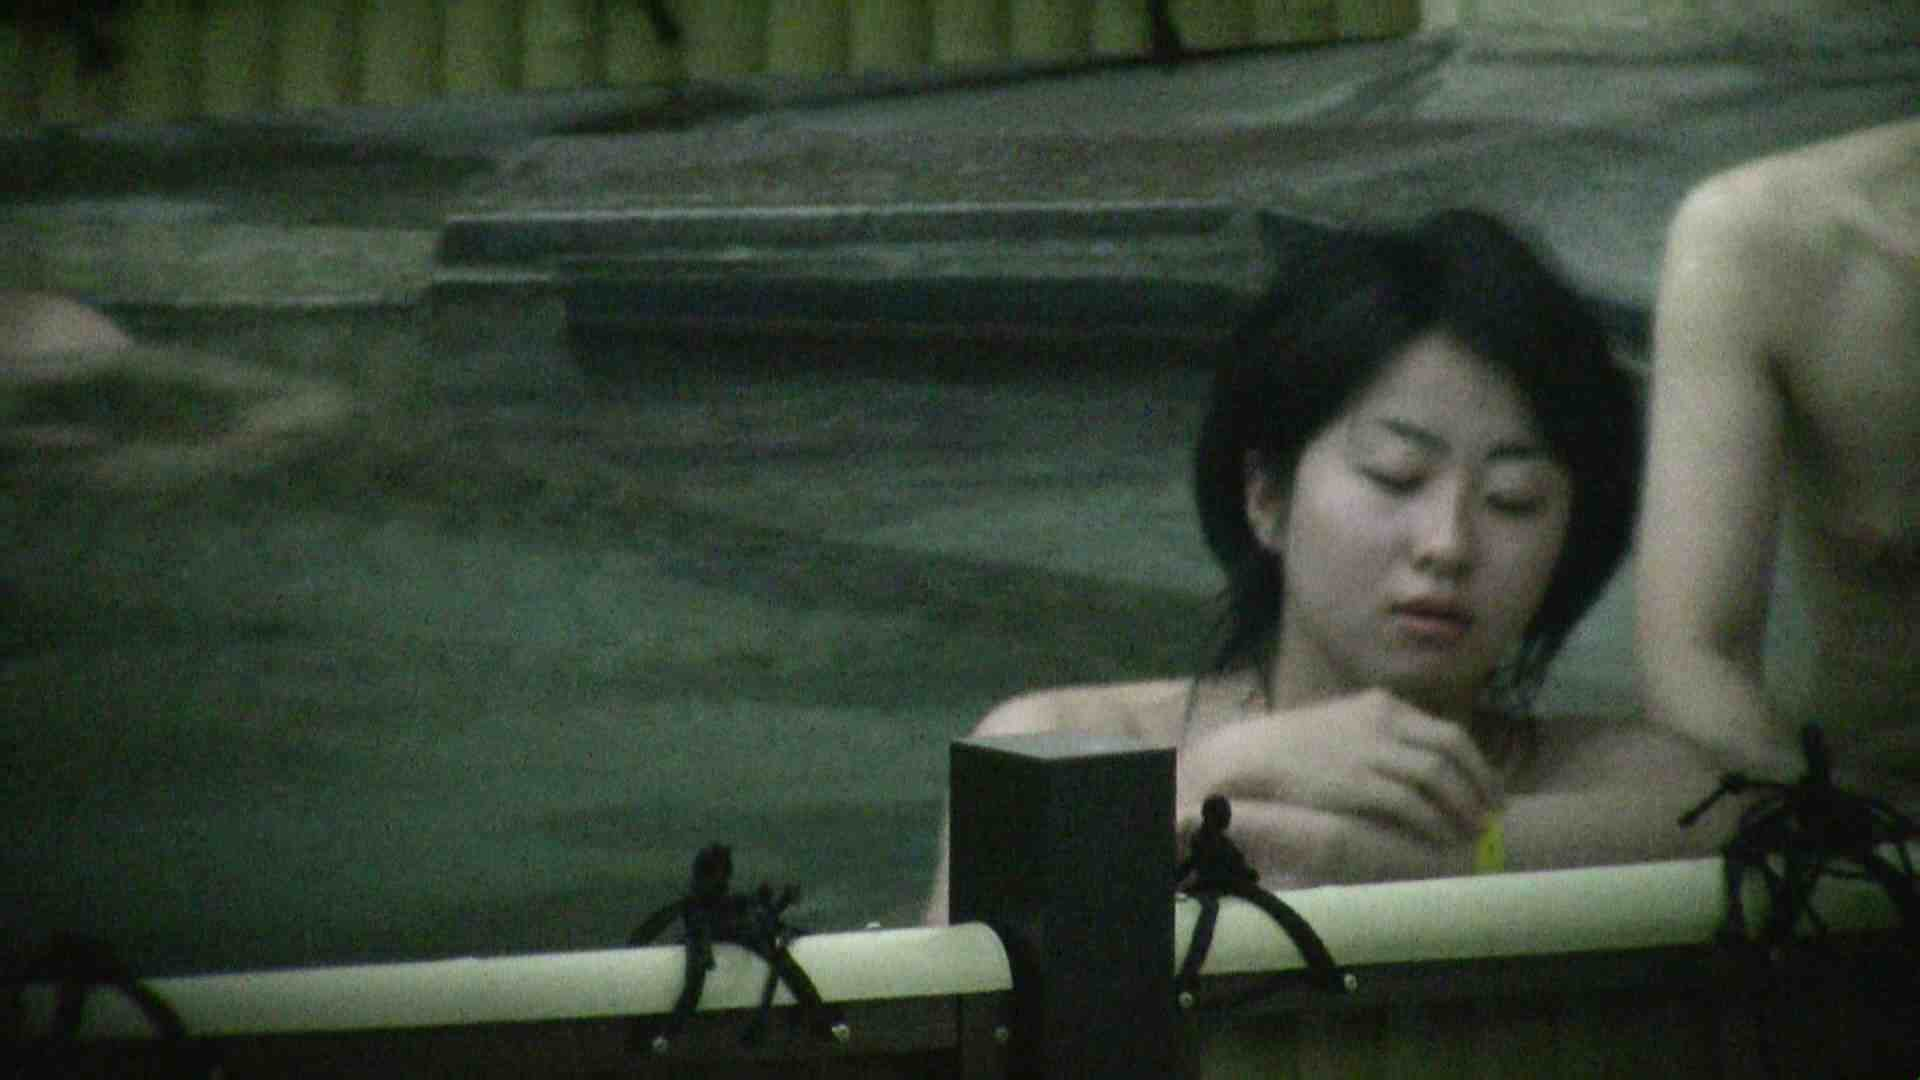 Aquaな露天風呂Vol.112 0  68連発 48